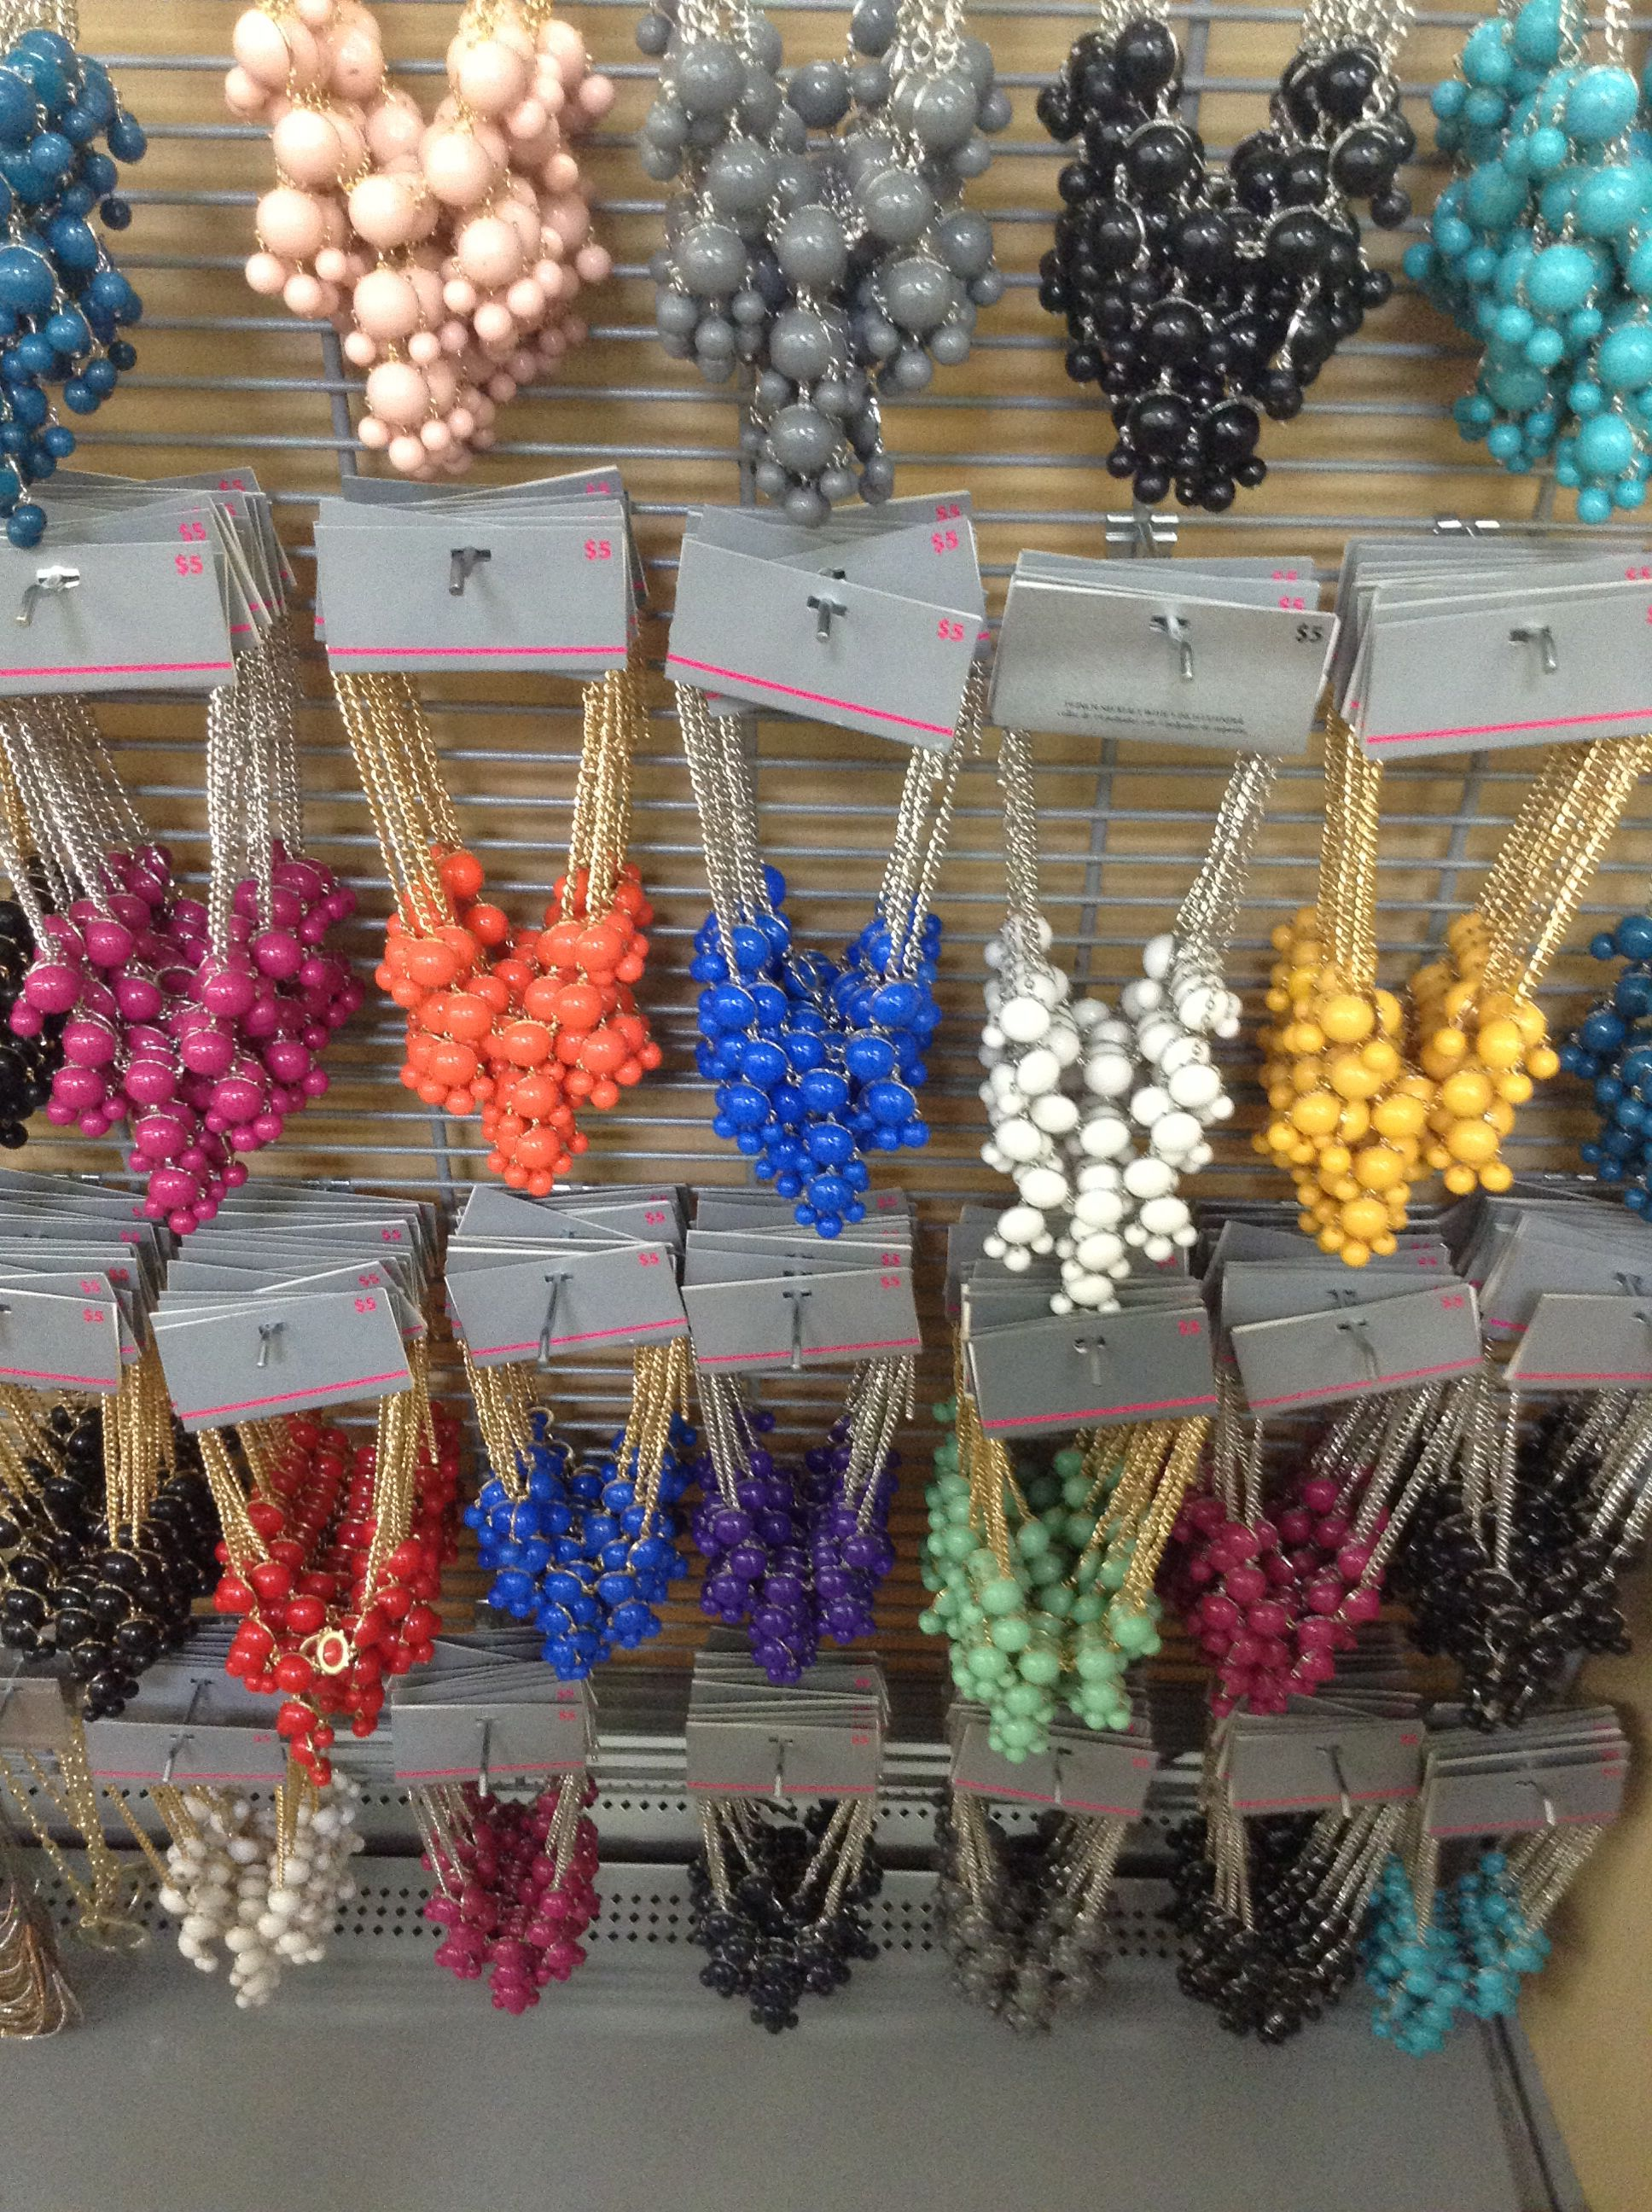 d4690c154f3da Statement necklaces from Walmart | Accesories | Statement necklace ...